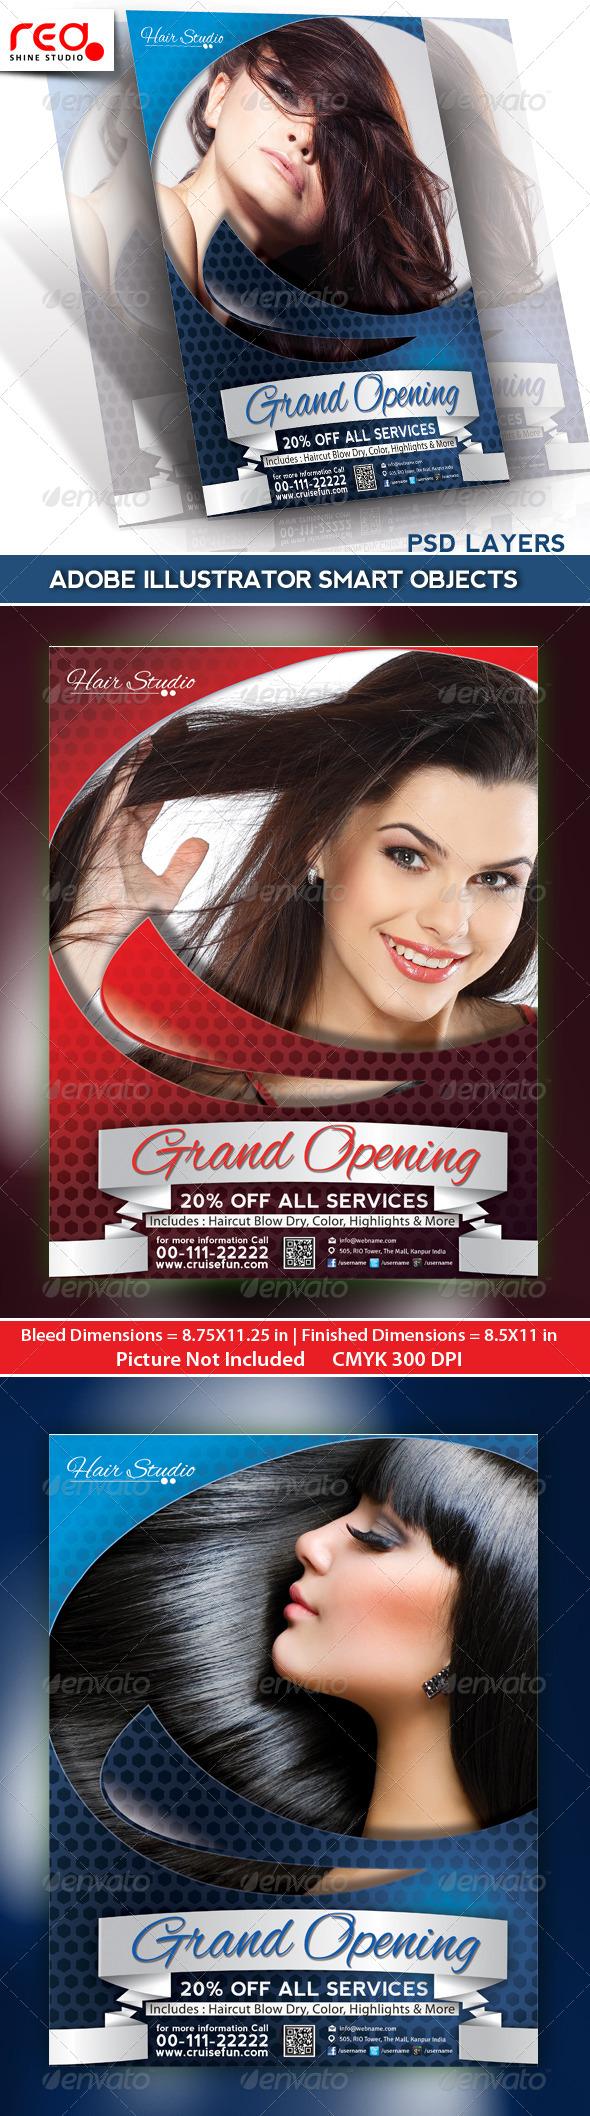 Hair Dresser Flyer/Poster Magazine Template  - Commerce Flyers